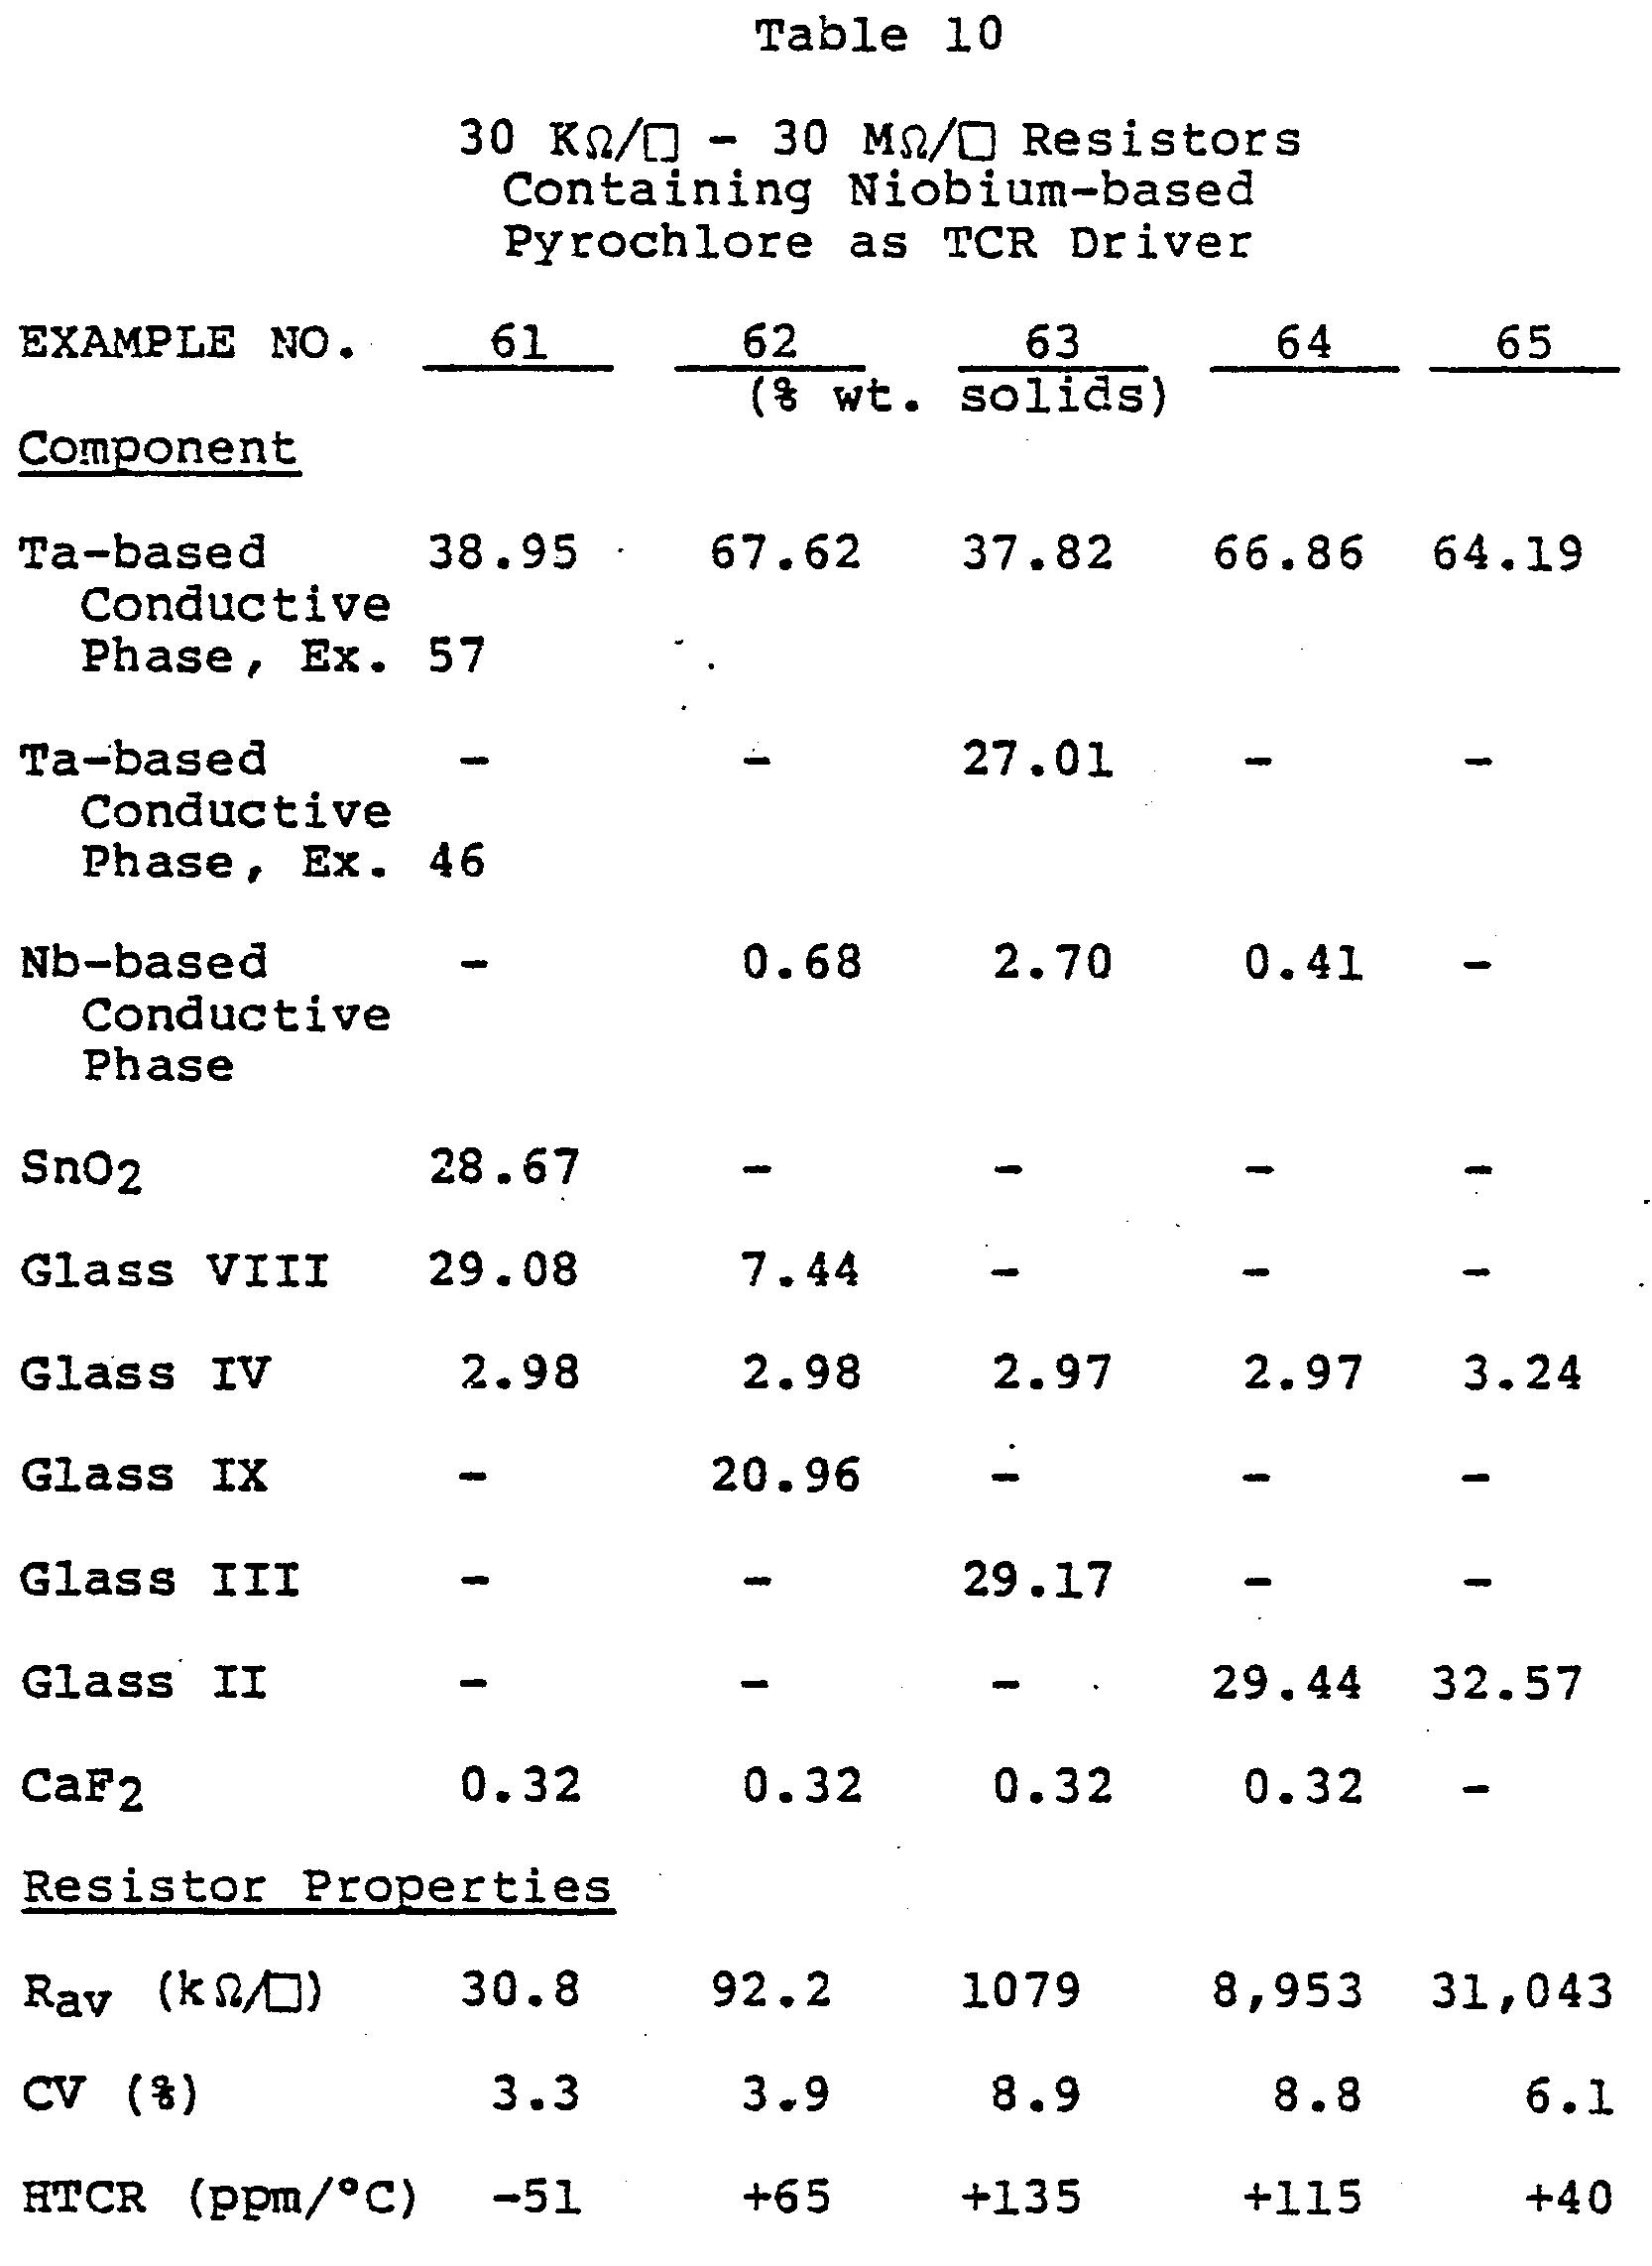 1 Microfarad Ceramic Capacitor Datasheet